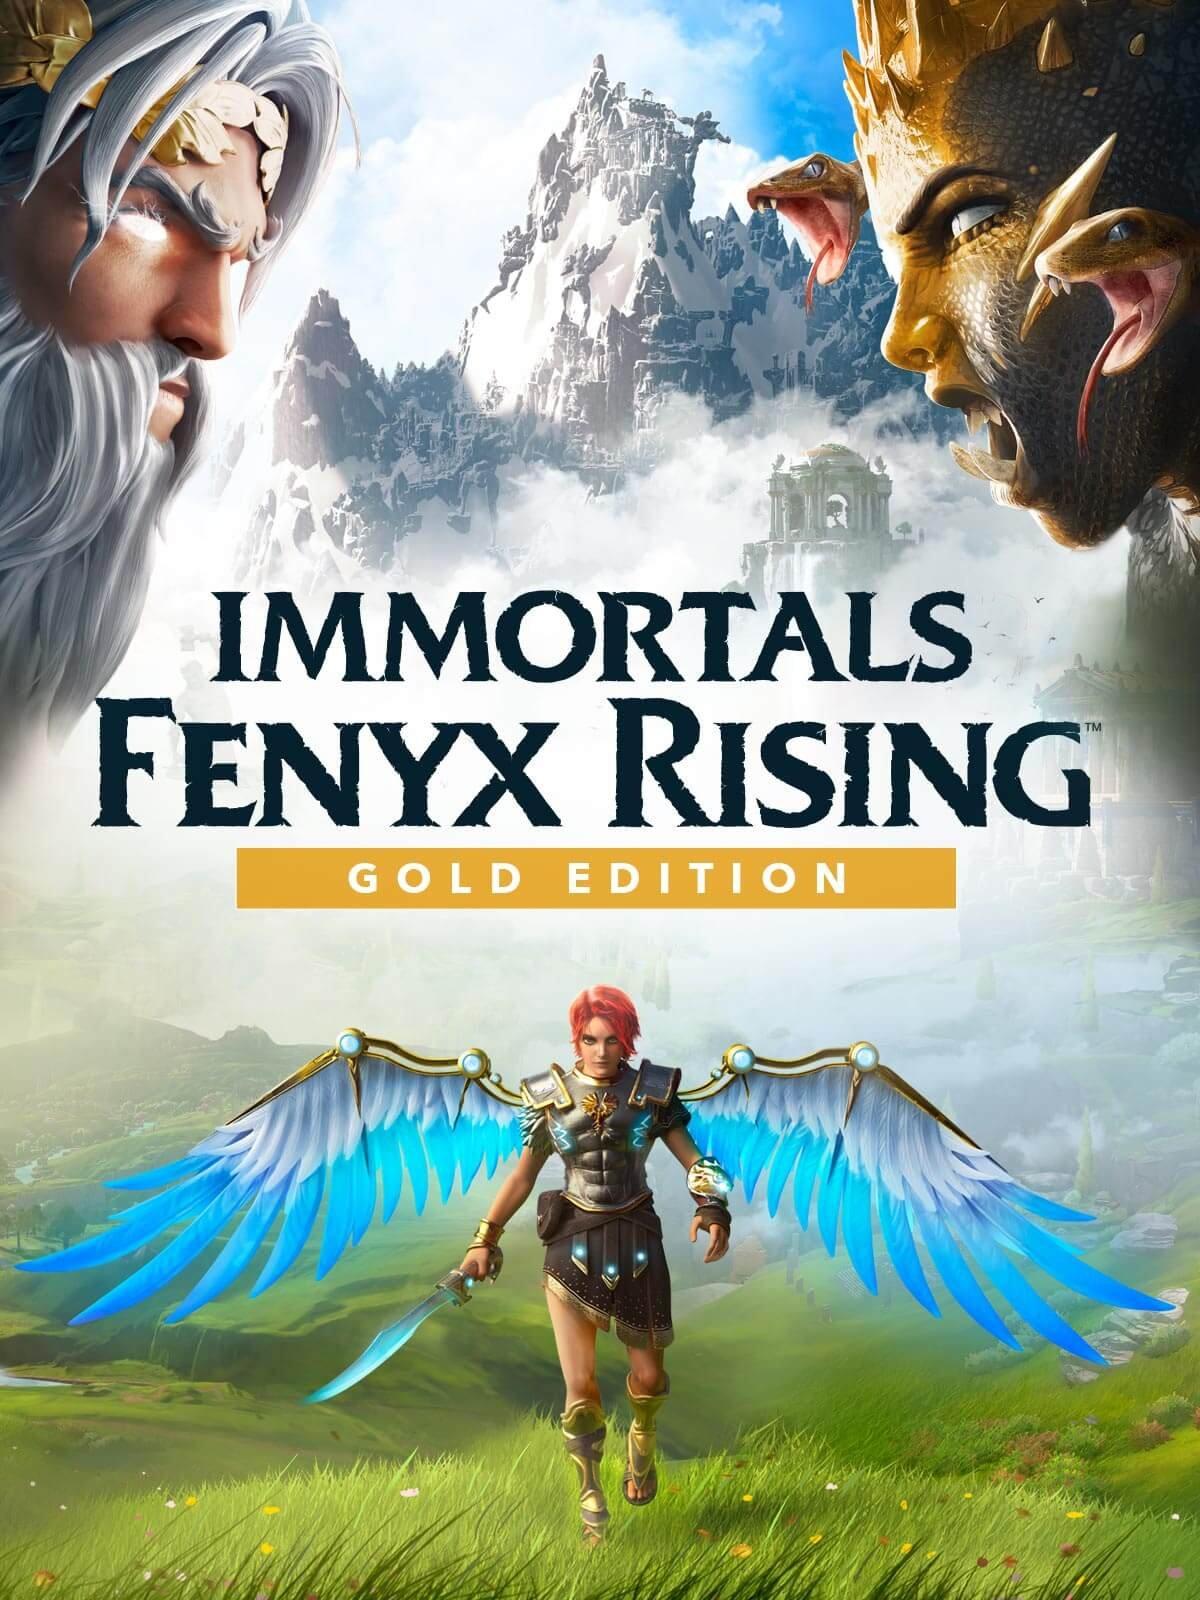 Immortals Fenyx Rising (PC) Review 1